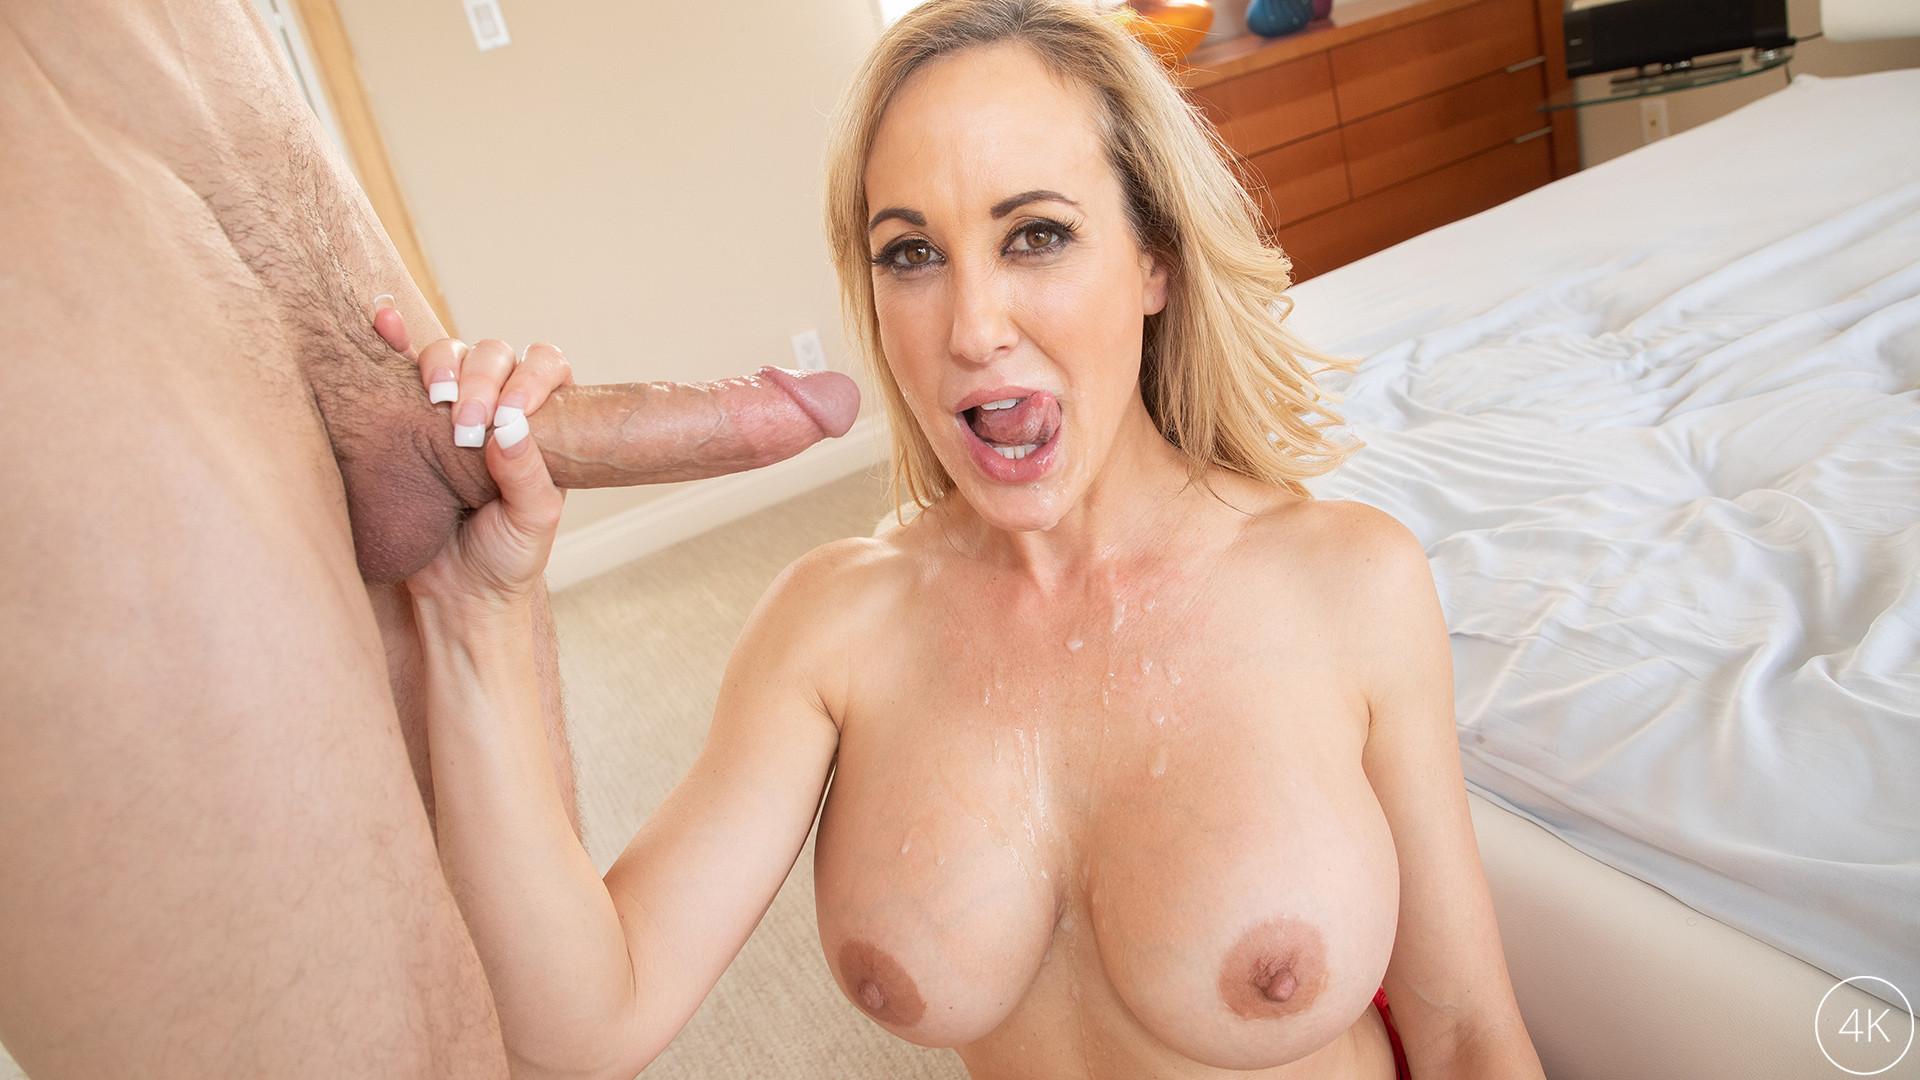 Download JulesJordan.com - Mommy Wants Meat: Brandi Love Gets A Supersized Cock